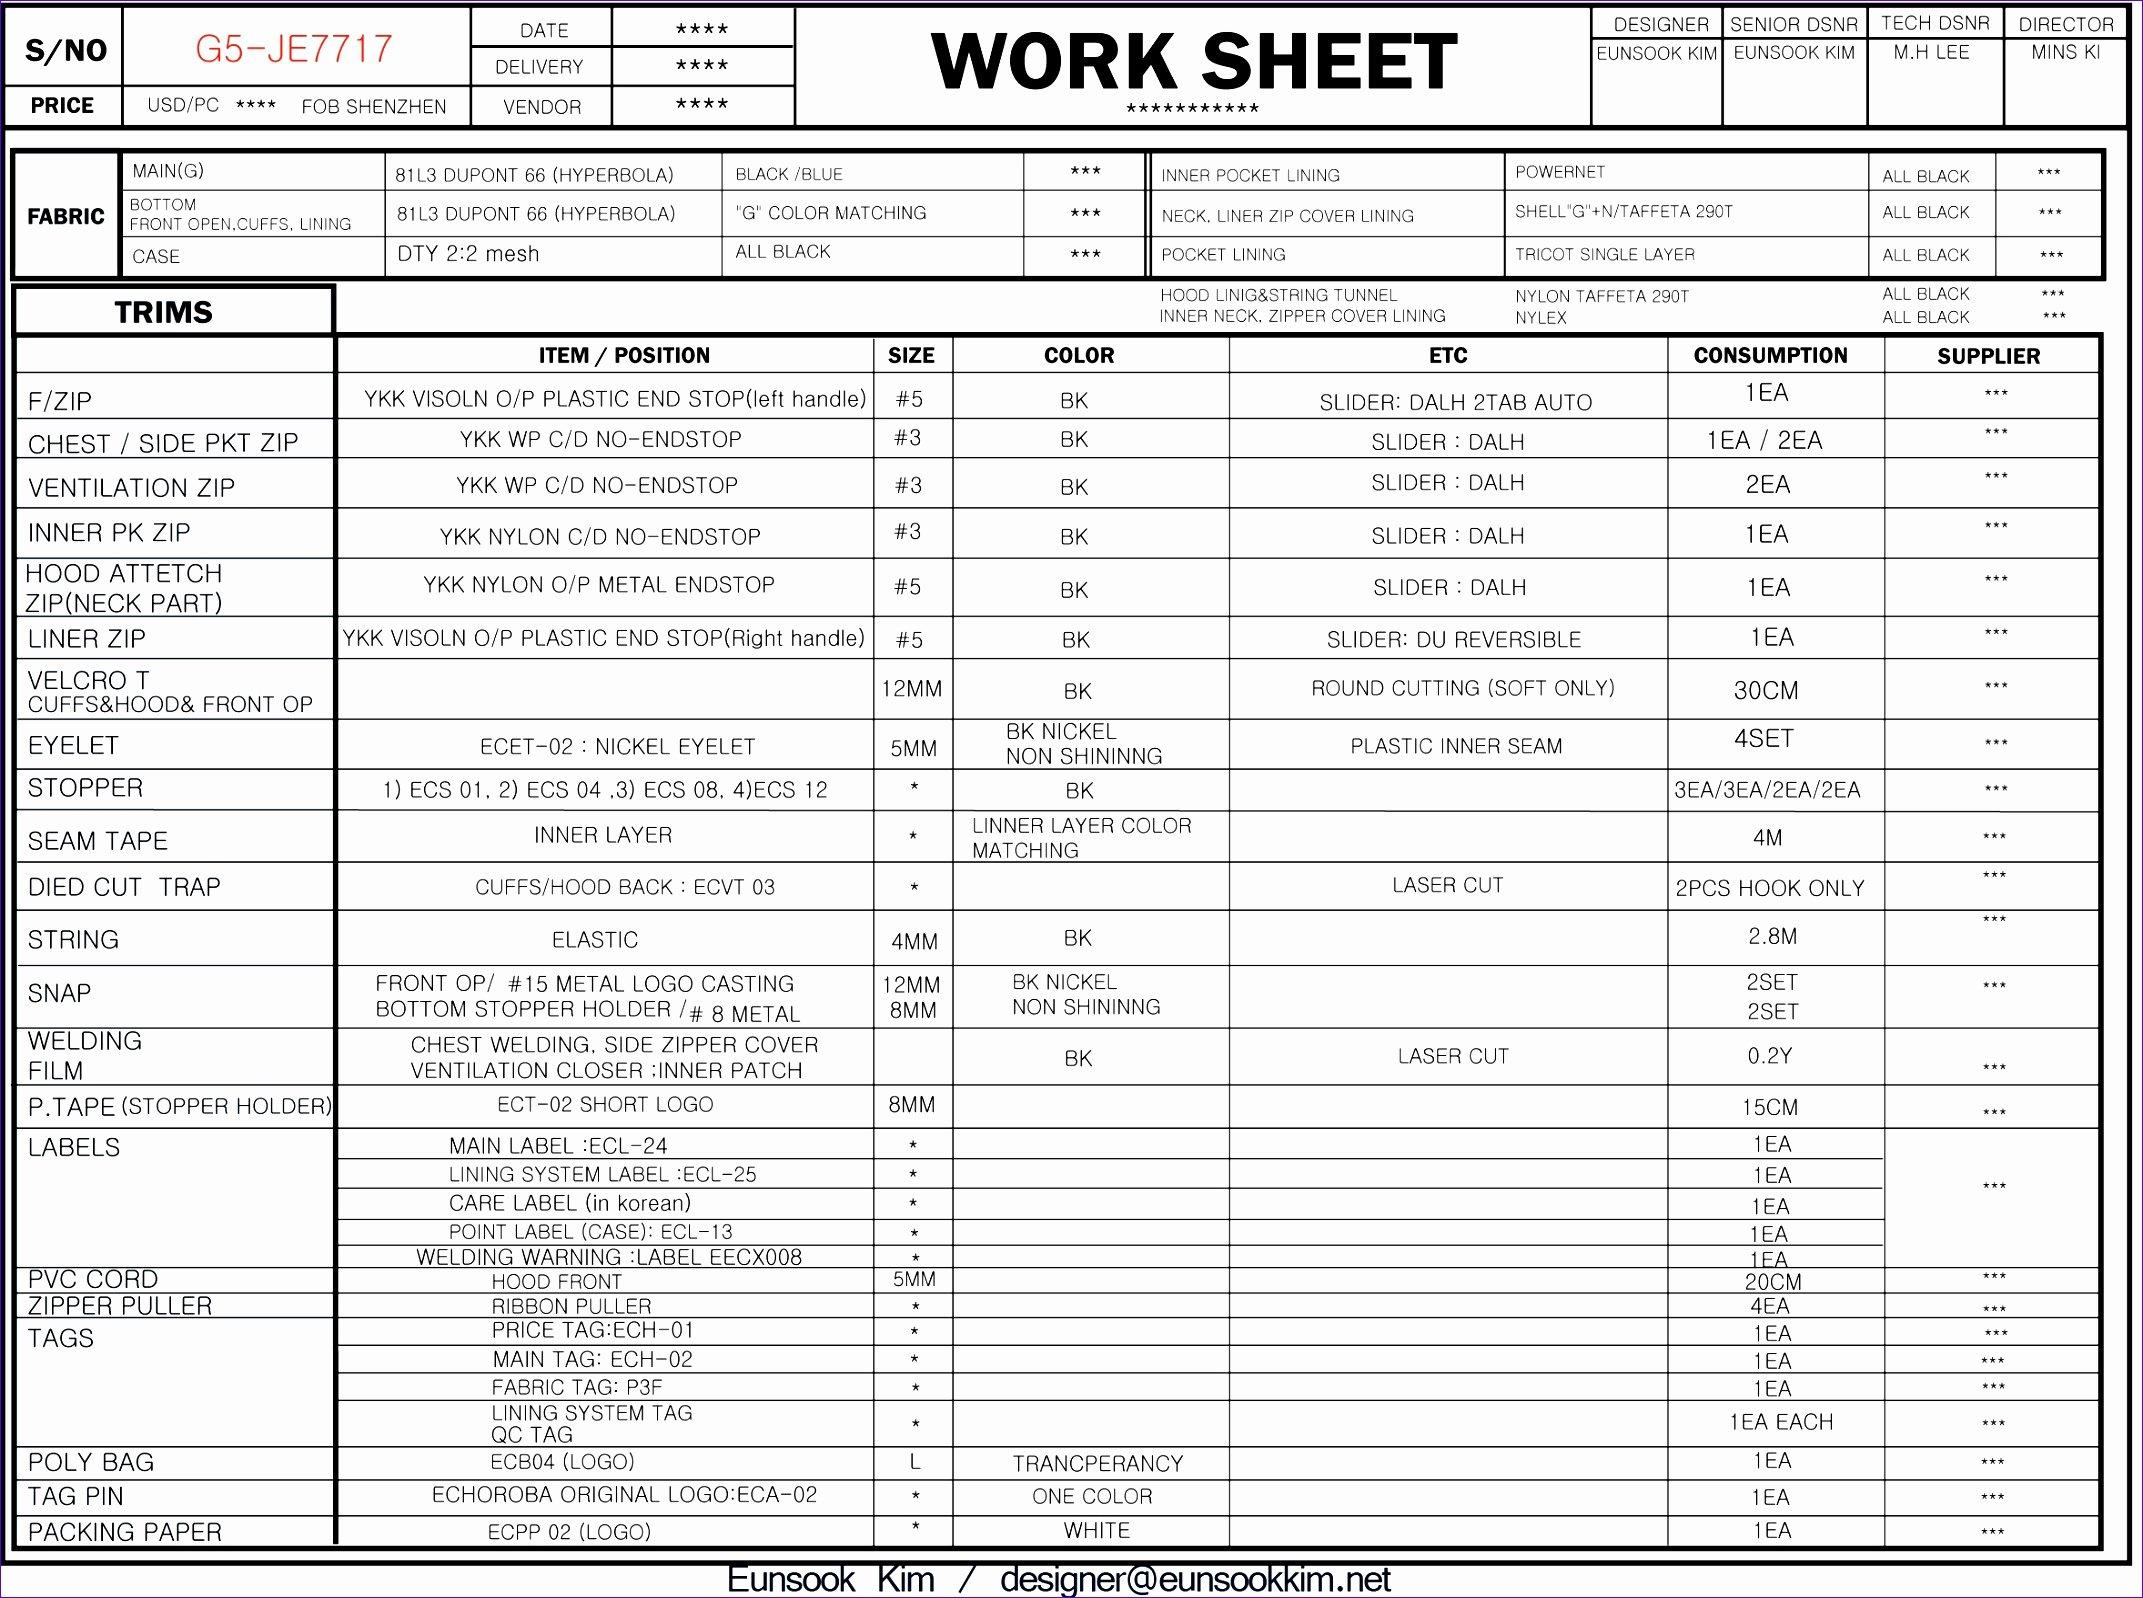 Quality Control Plan Template Excel Elegant Quality Control Plan Template Excel Tcxzb Beautiful